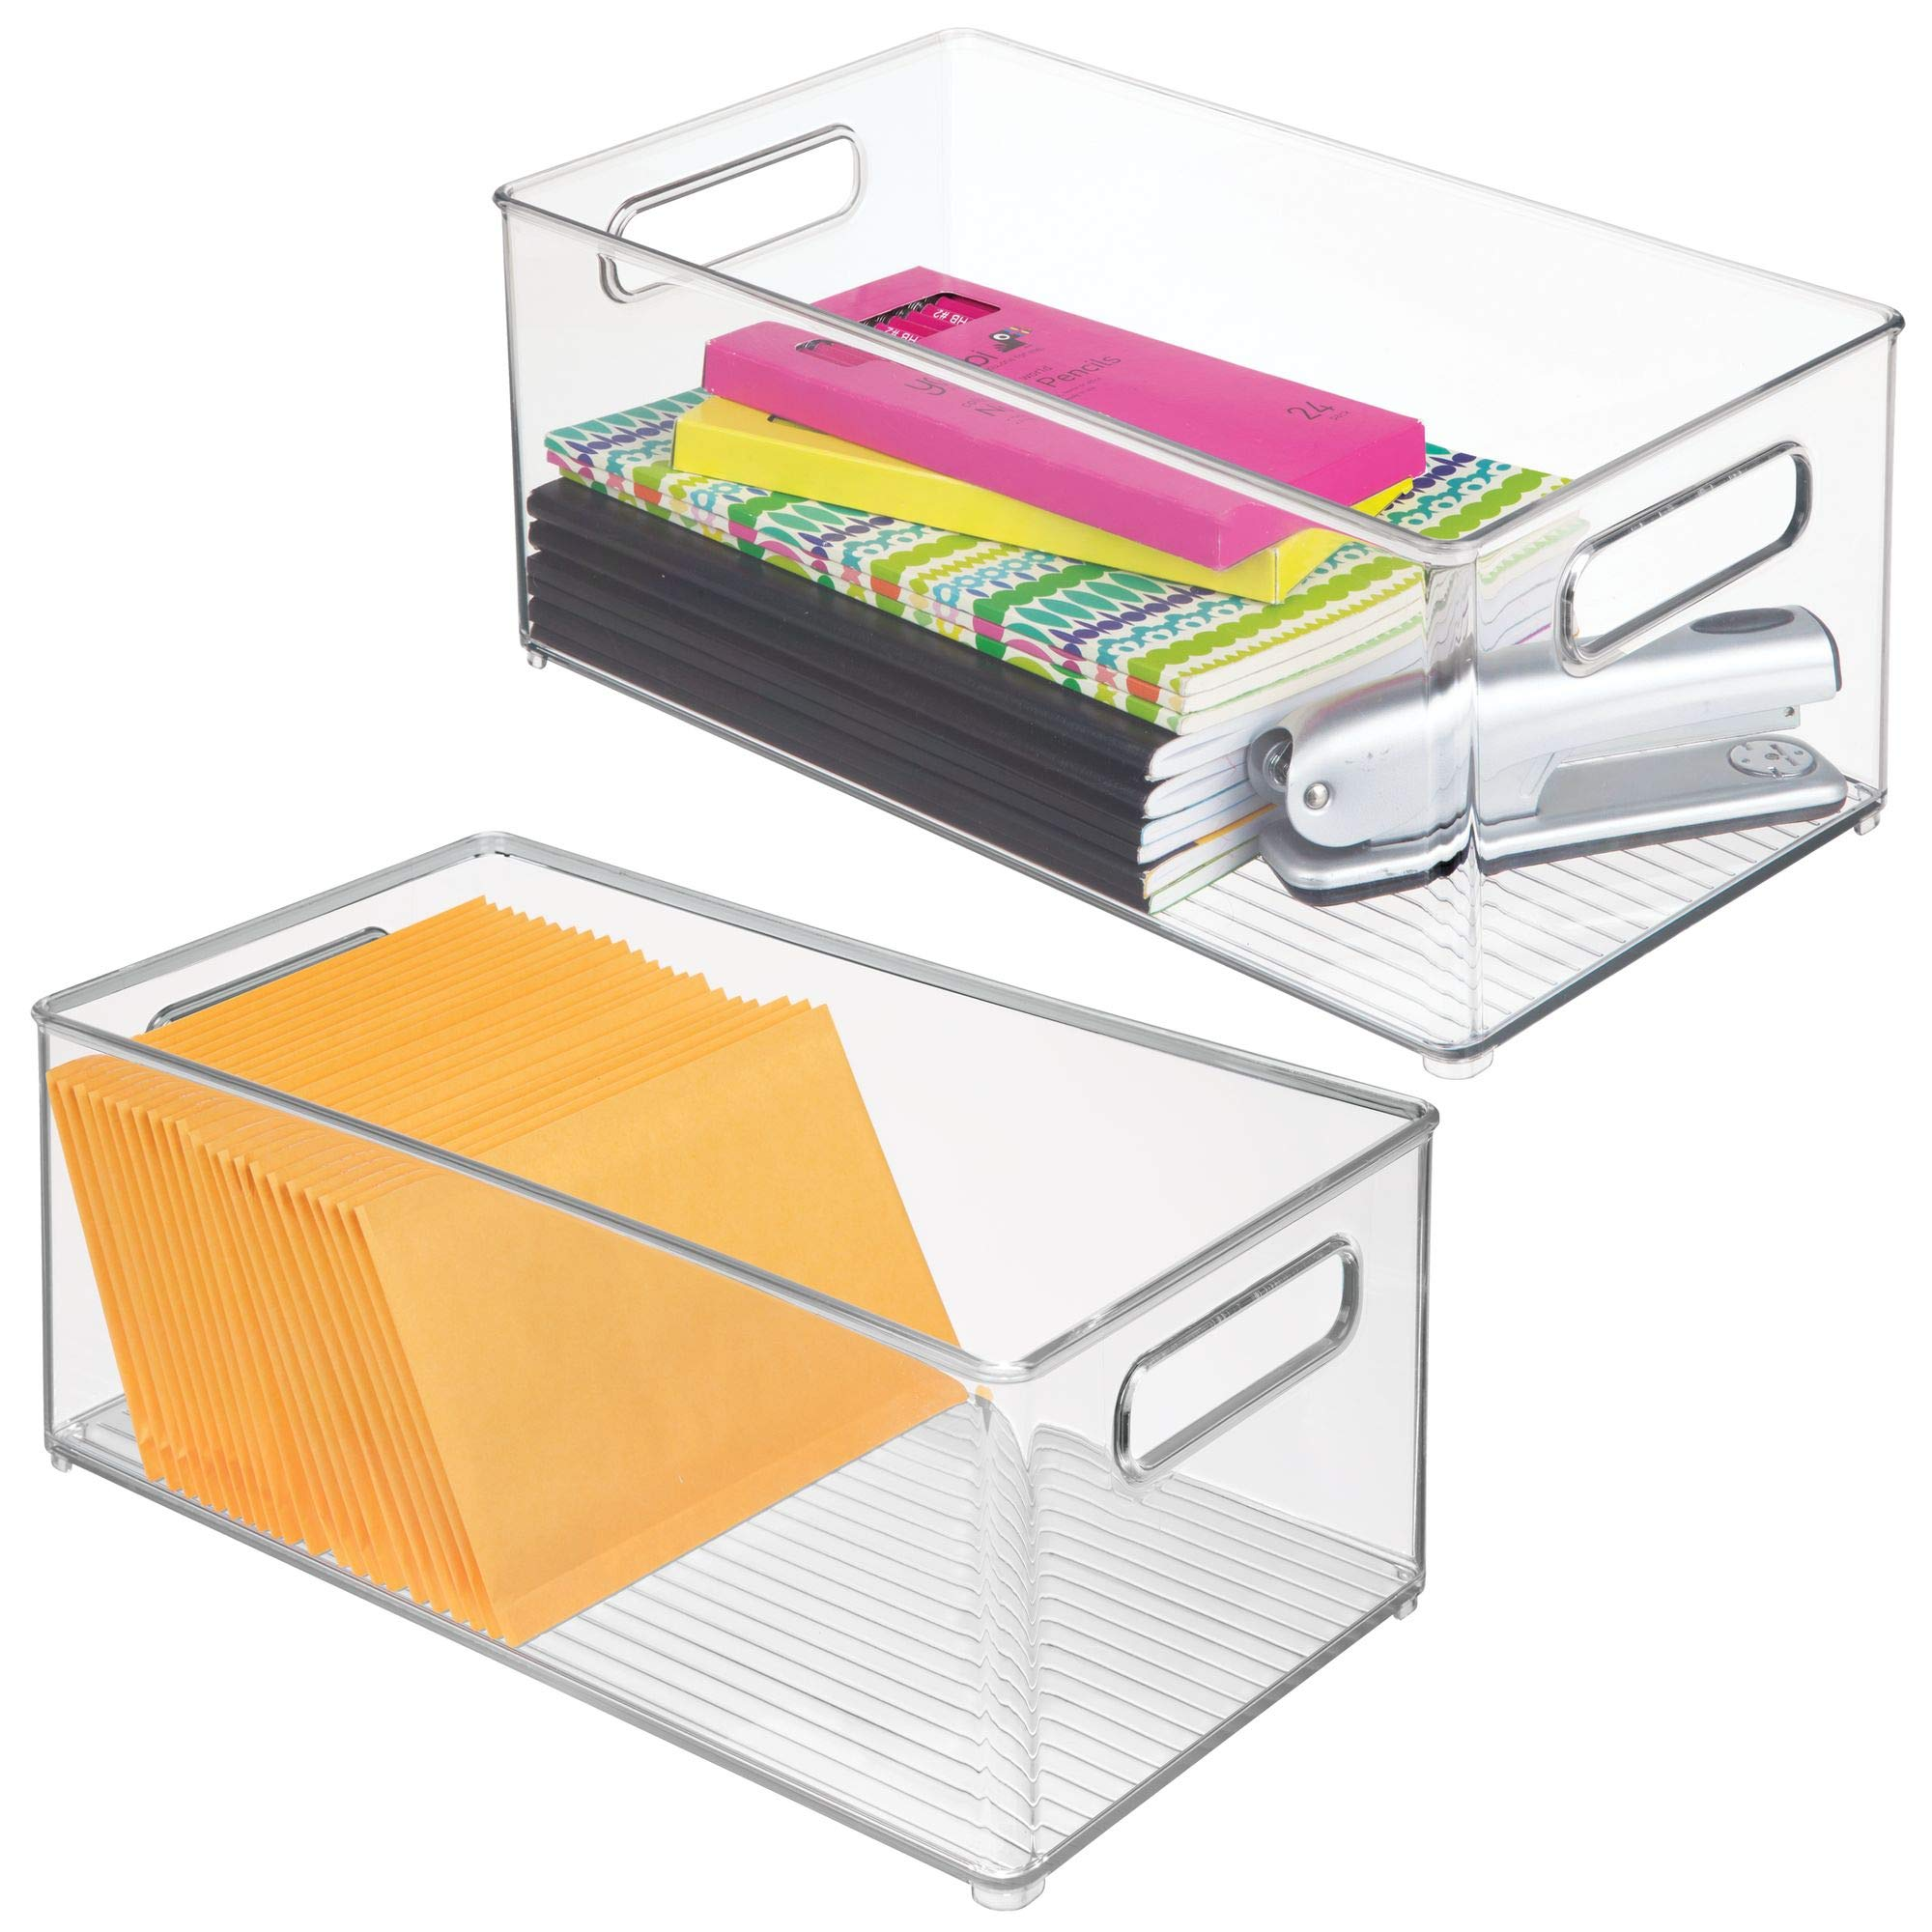 mDesign Office/Desktop Storage and Organization Bin - Pack of 2, Deep, Clear